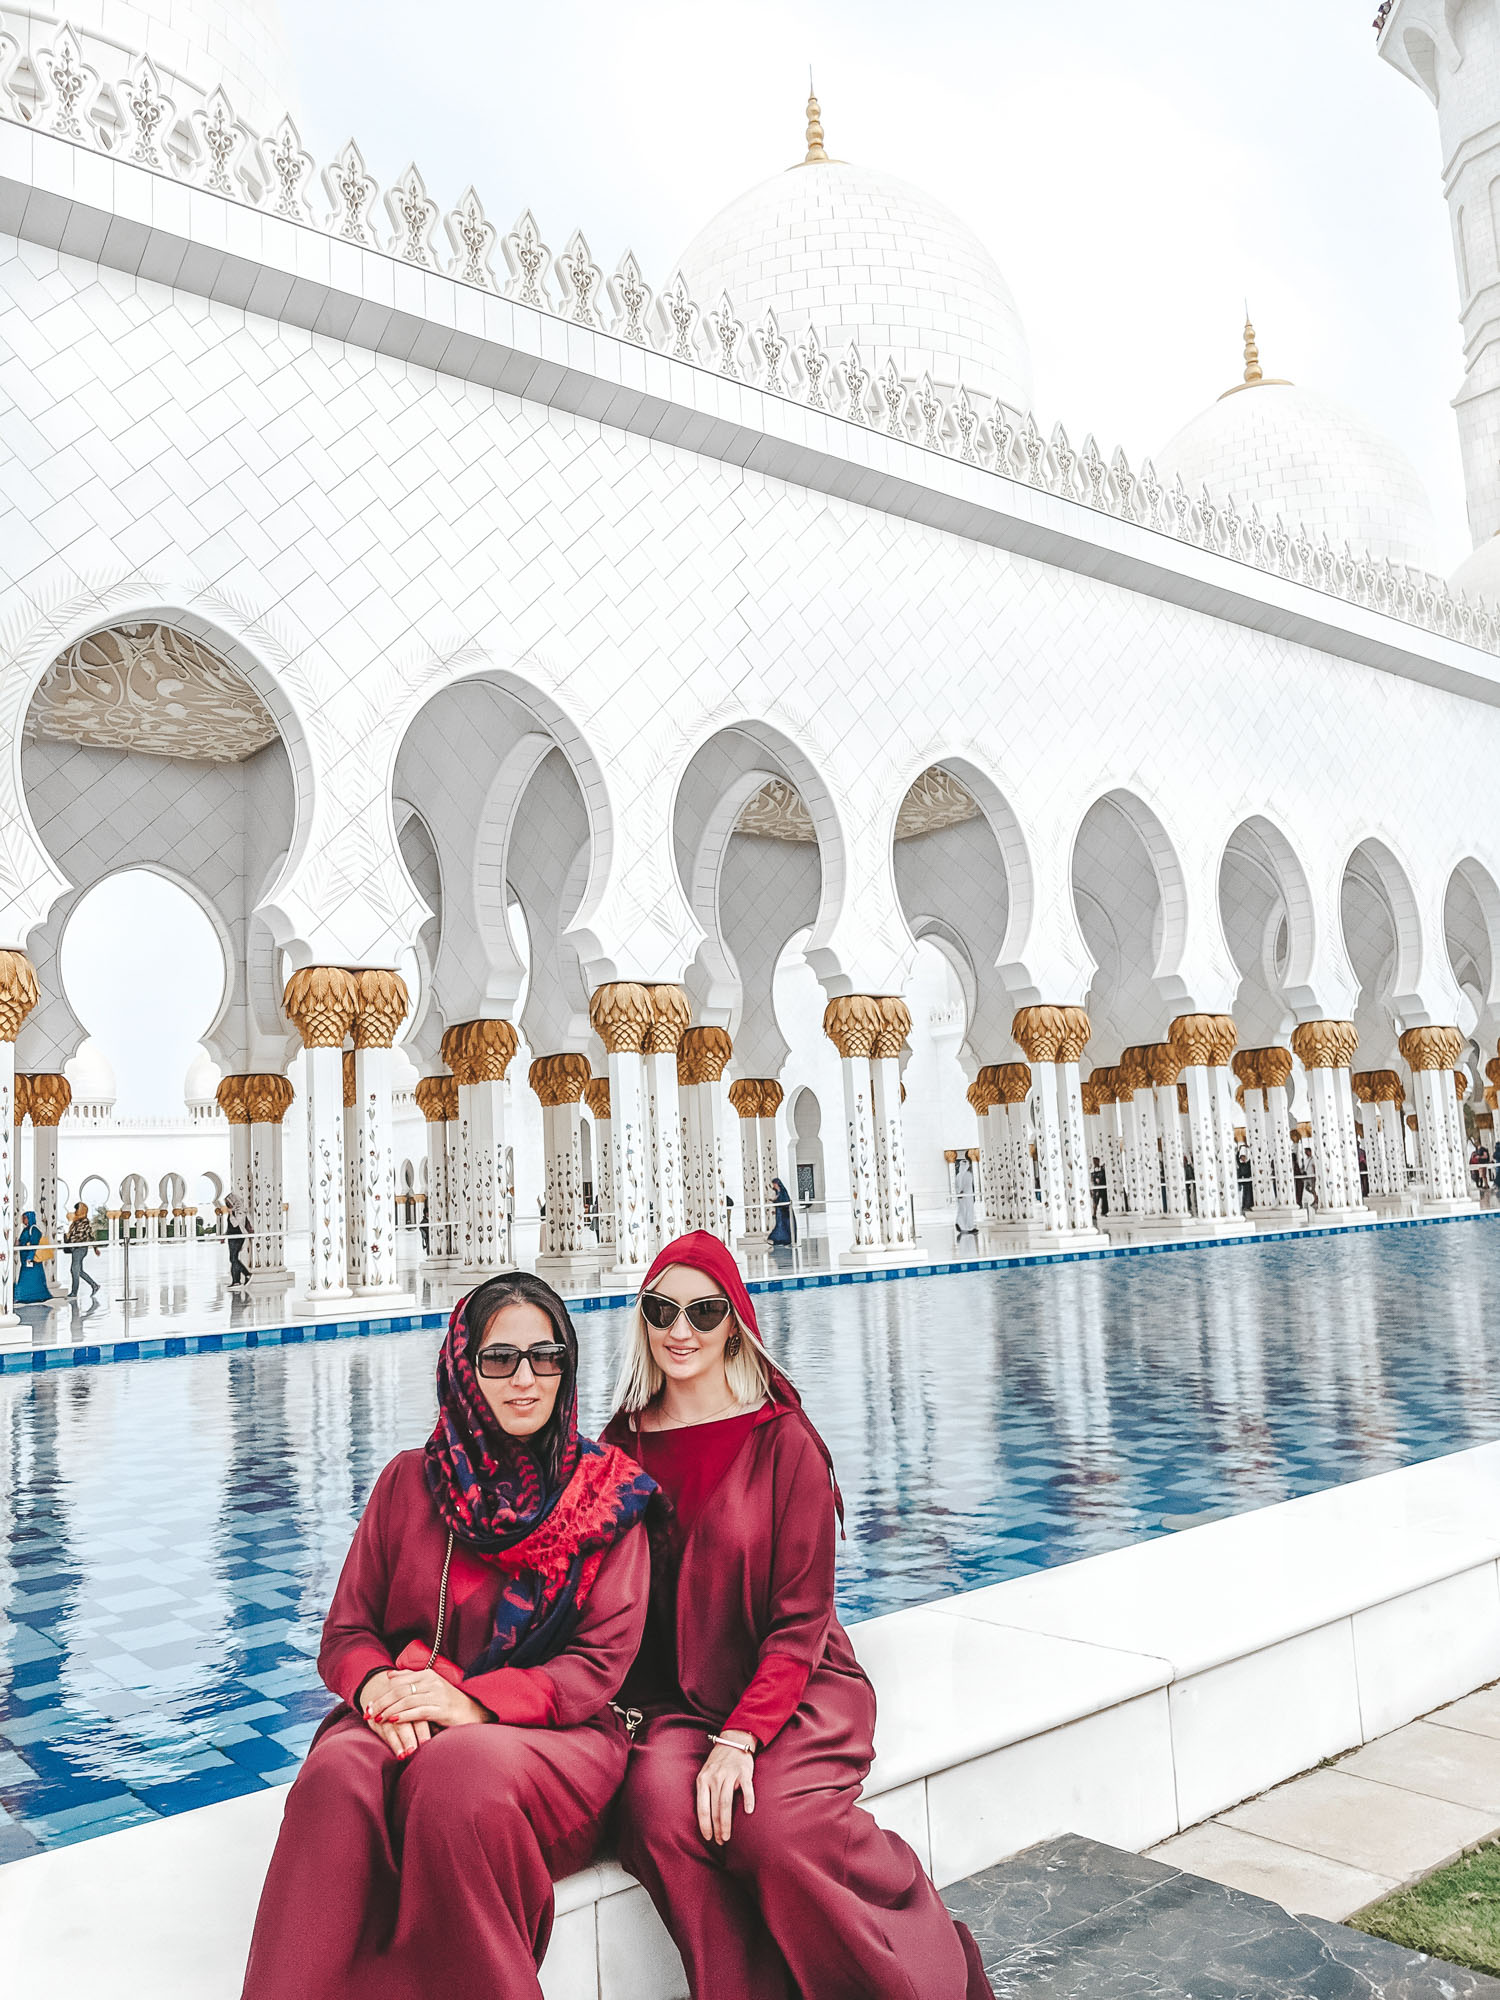 Sheikh Zayed Grand Mosque | Day trip to Abu Dhabi from Dubai